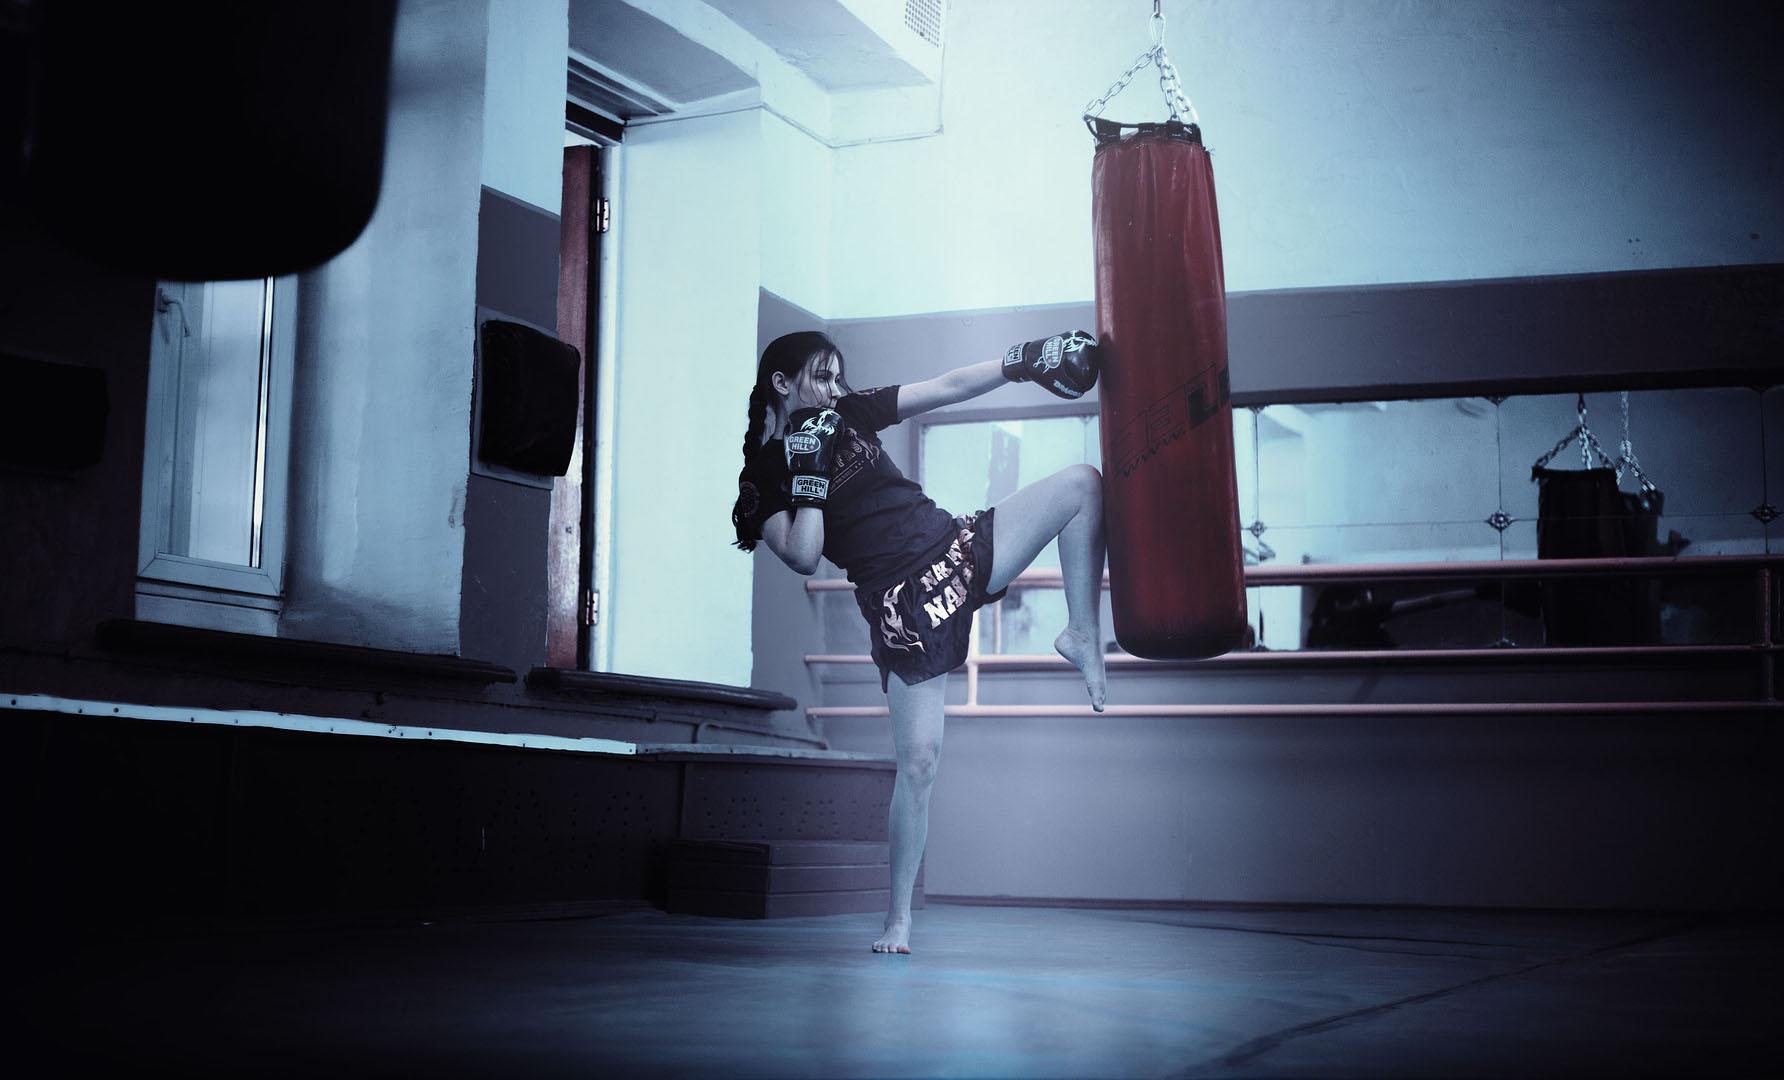 kickboxer-girl メンタルヘルス対策としても効果的なキックボクシング